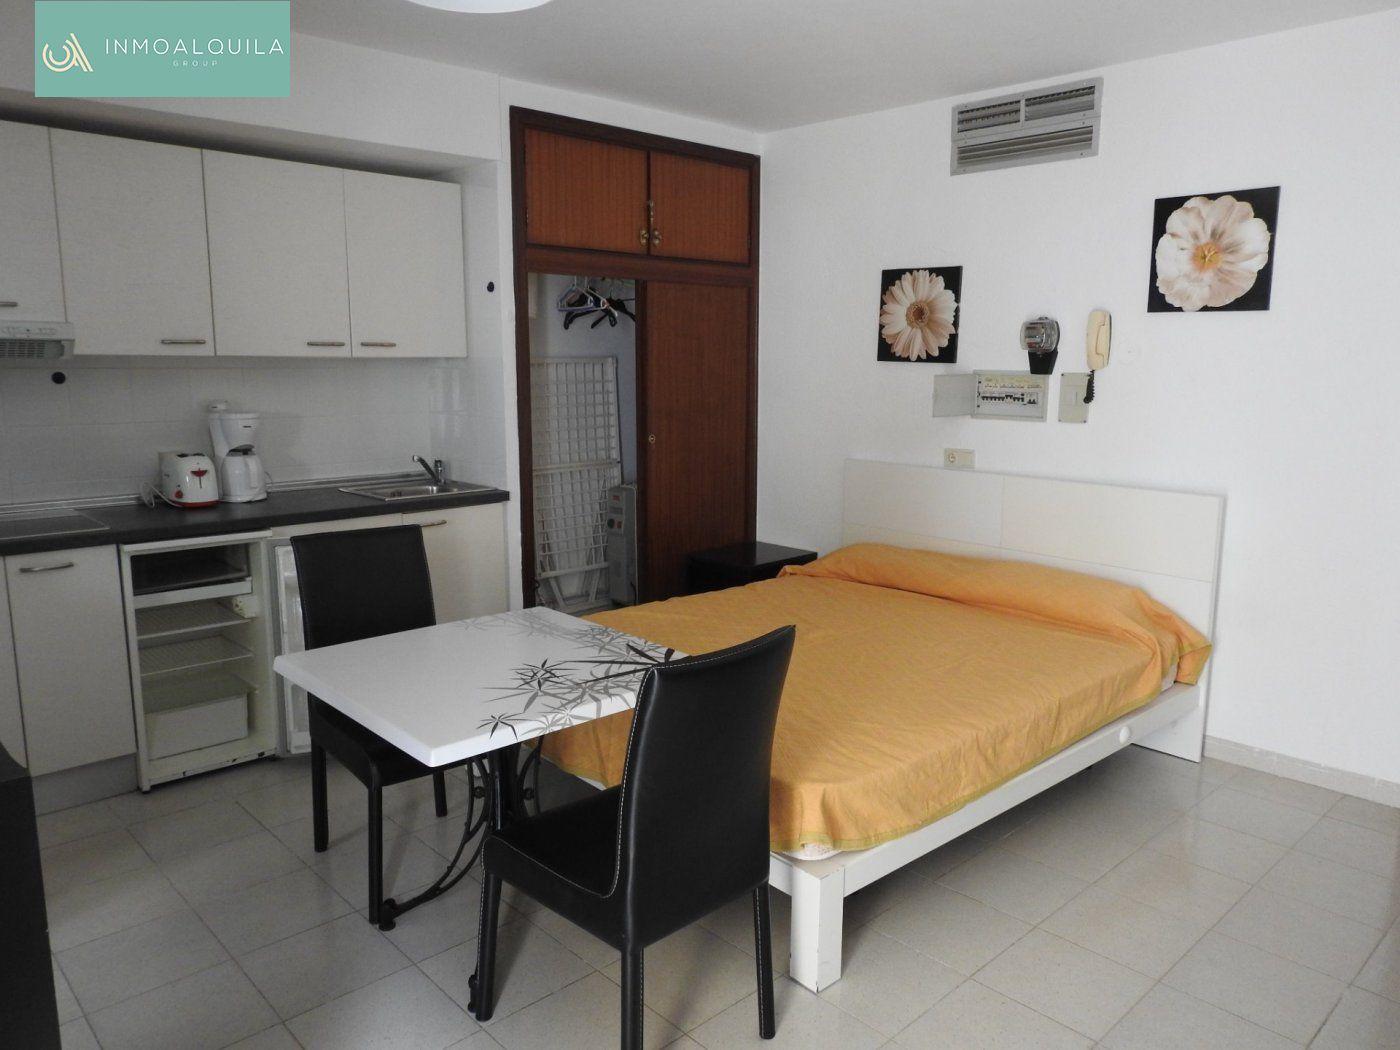 Location Appartement  Can picafort ,can picafort. Estudio en alquiler en can picafort. 575€/mes